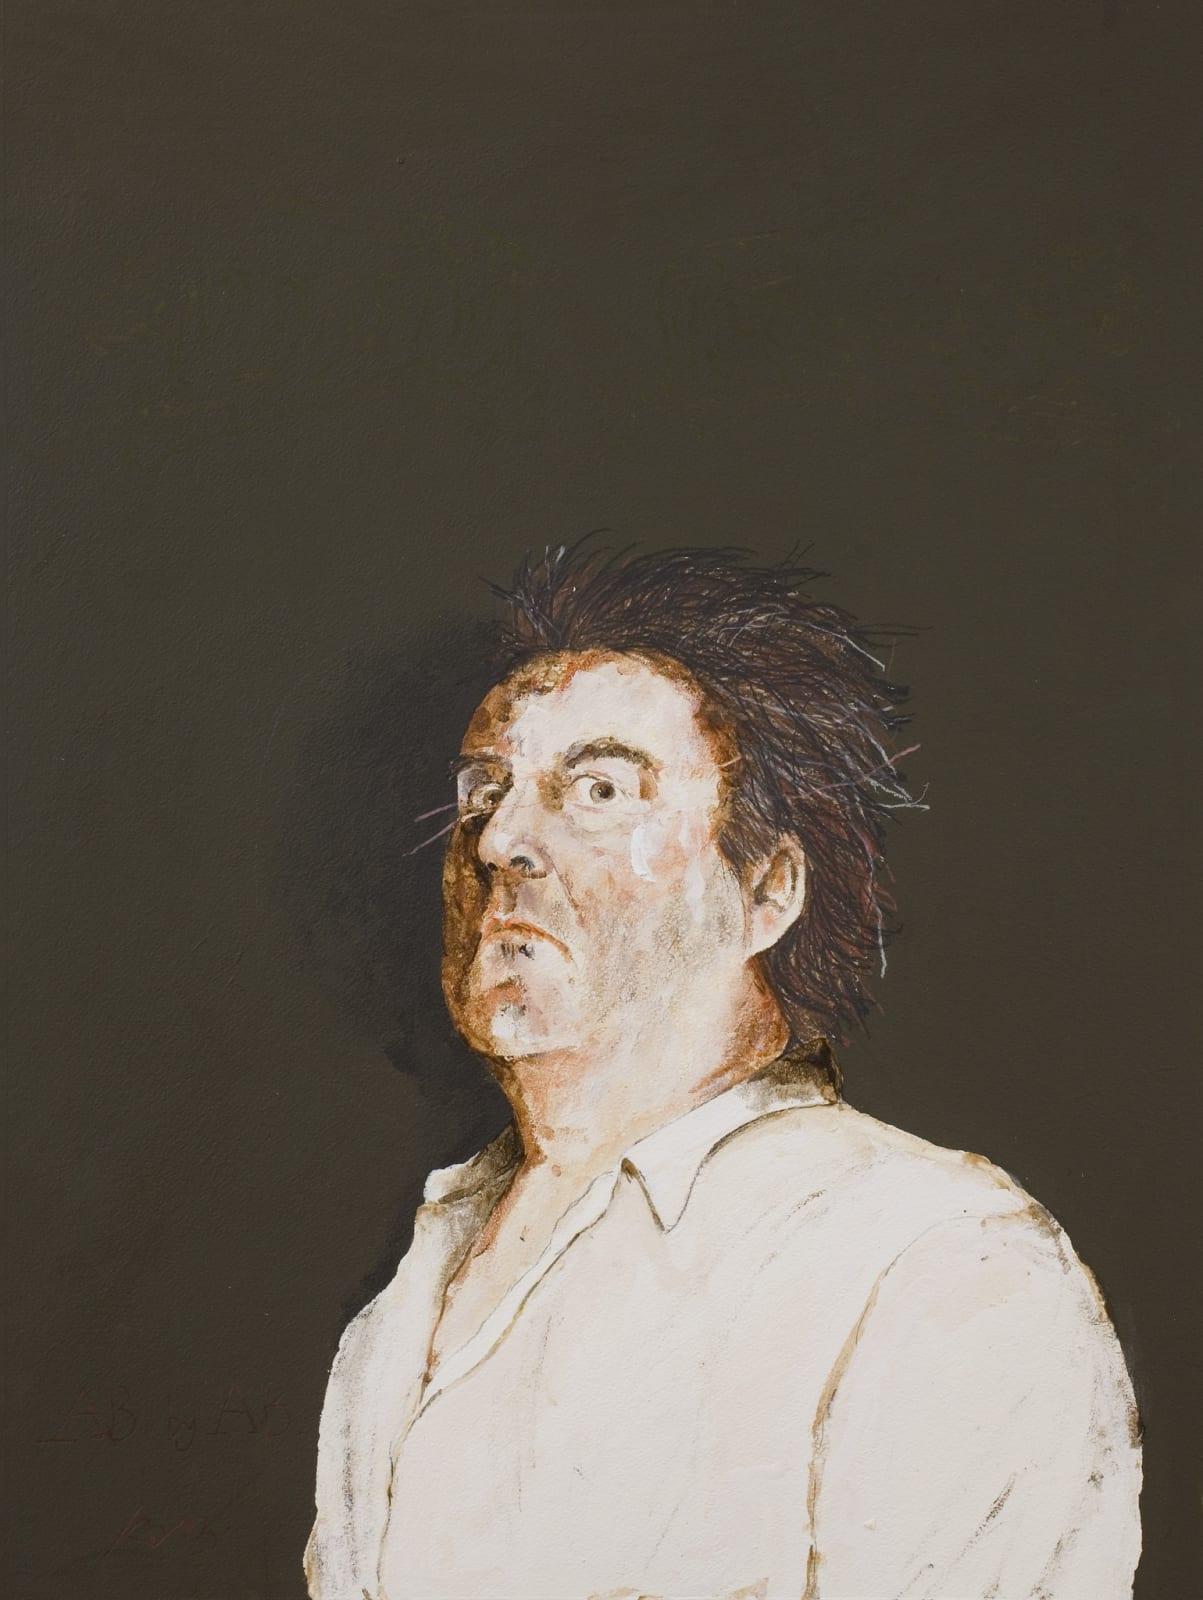 Adam Birtwistle, Self-Portrait, 2013